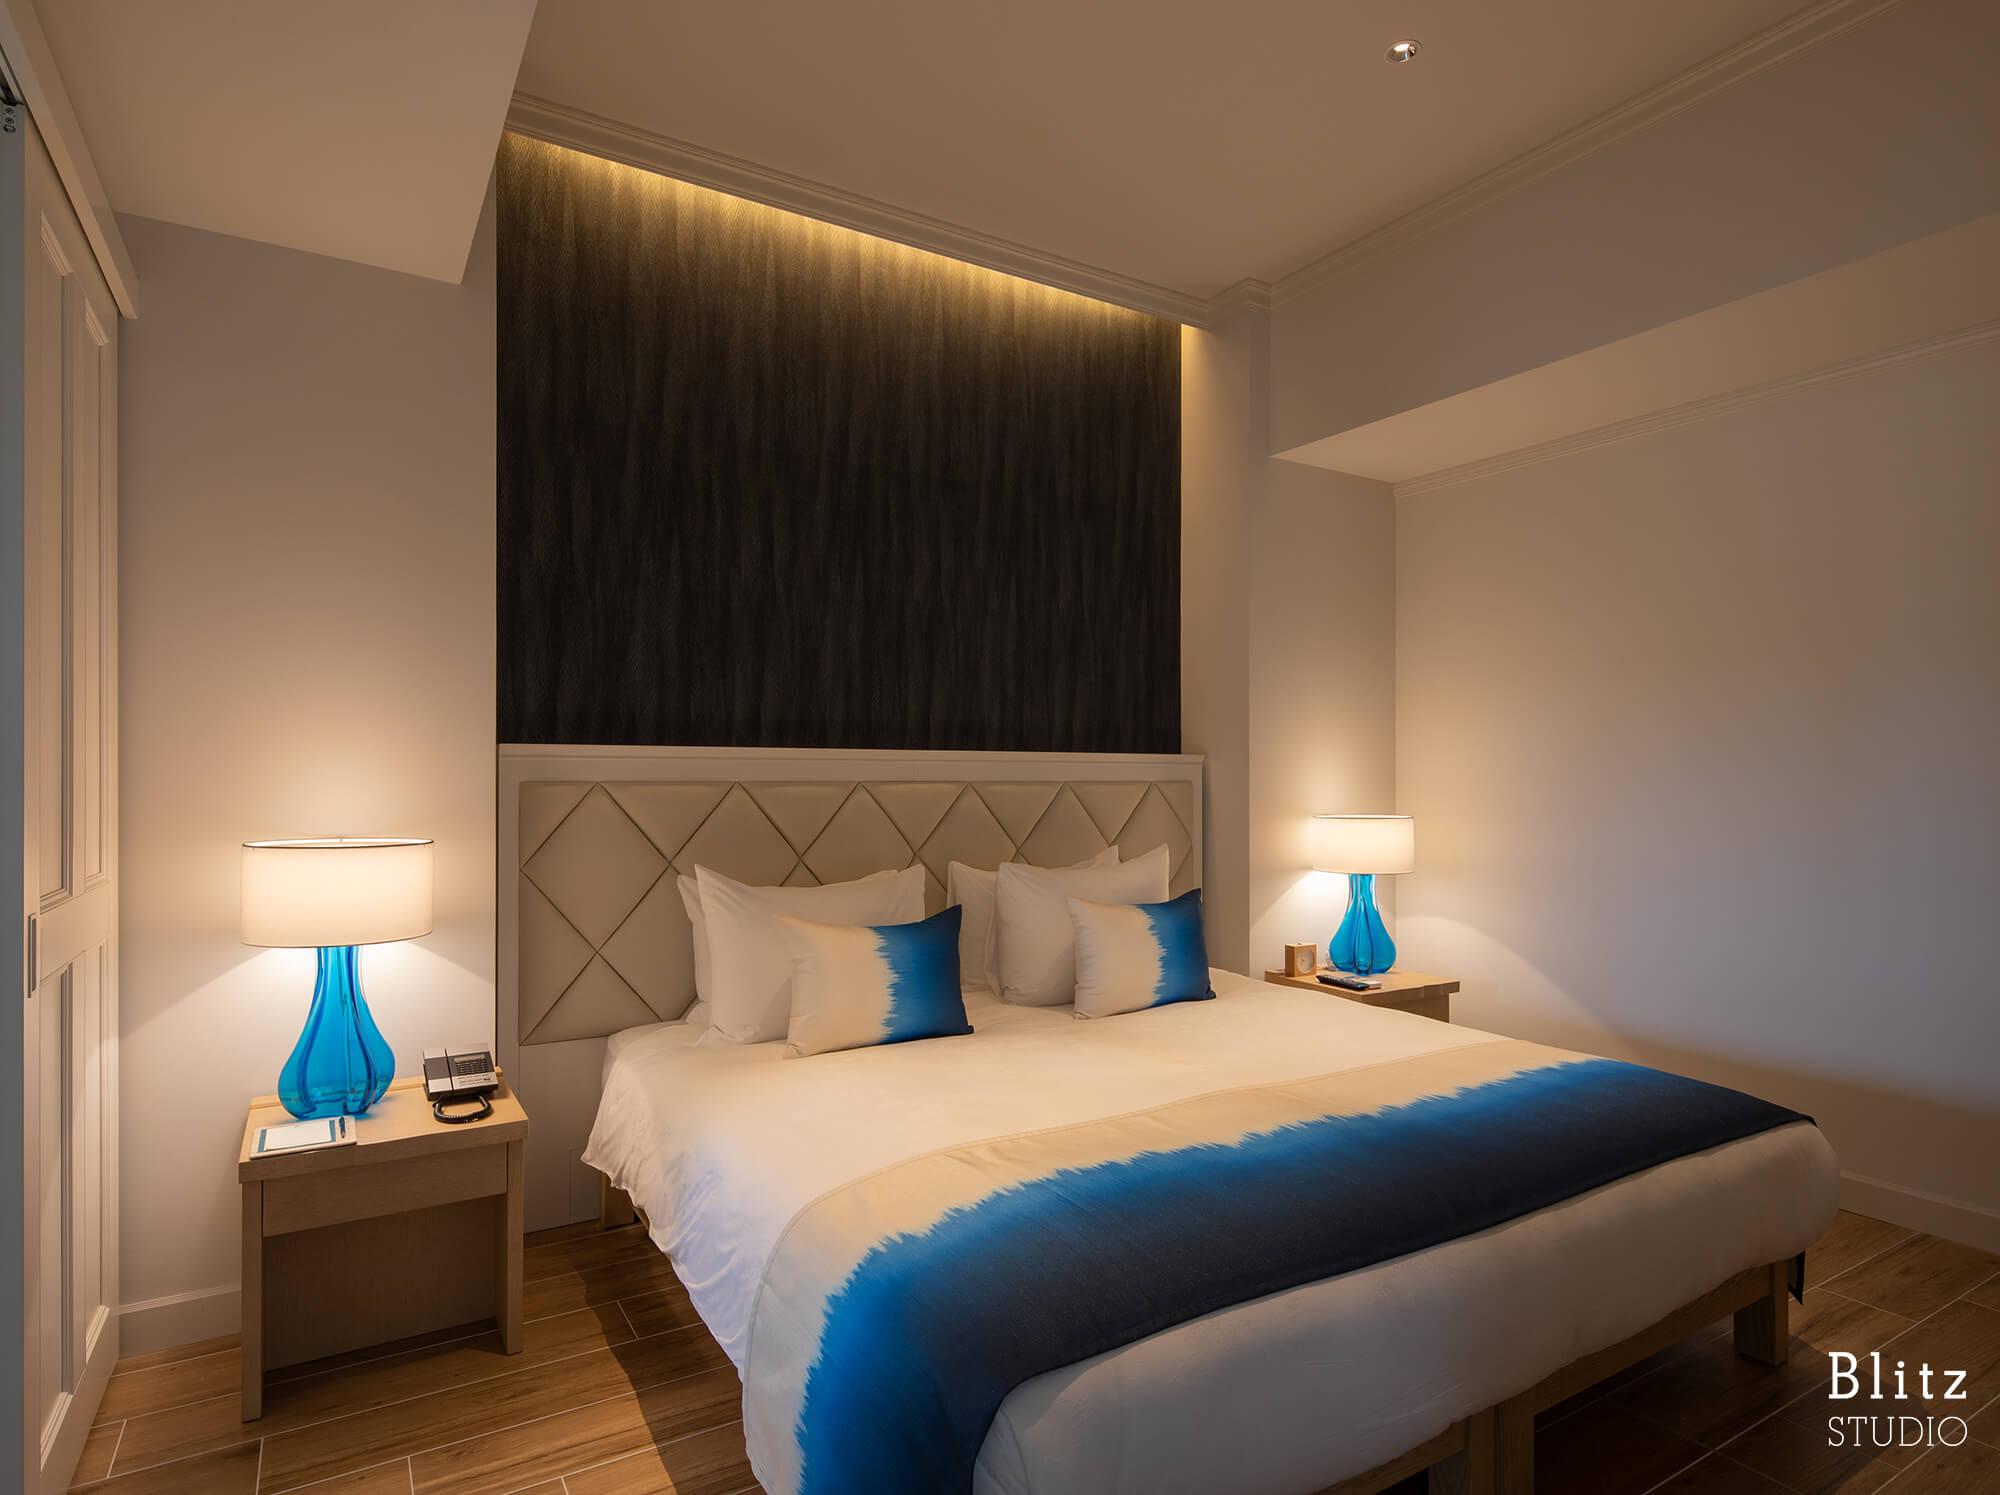 『HOTEL SHIGIRA MIRAGE BAYSIDE』建築写真・竣工写真・インテリア写真20